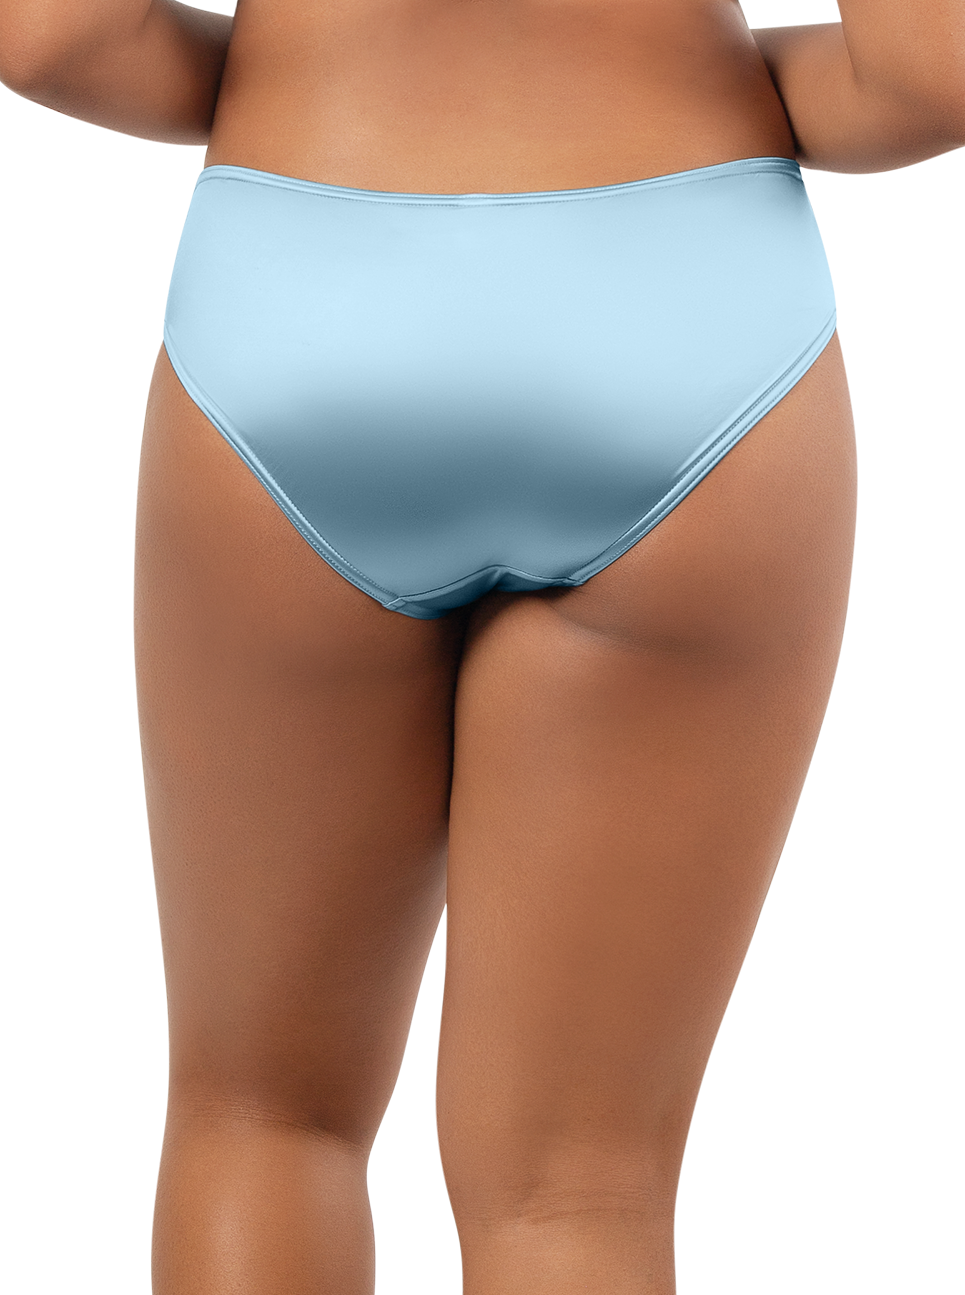 PARFAIT Rita Bikini BottomS8143 DreamBlue Black - Rita Bikini Bottom Dream Blue S8143